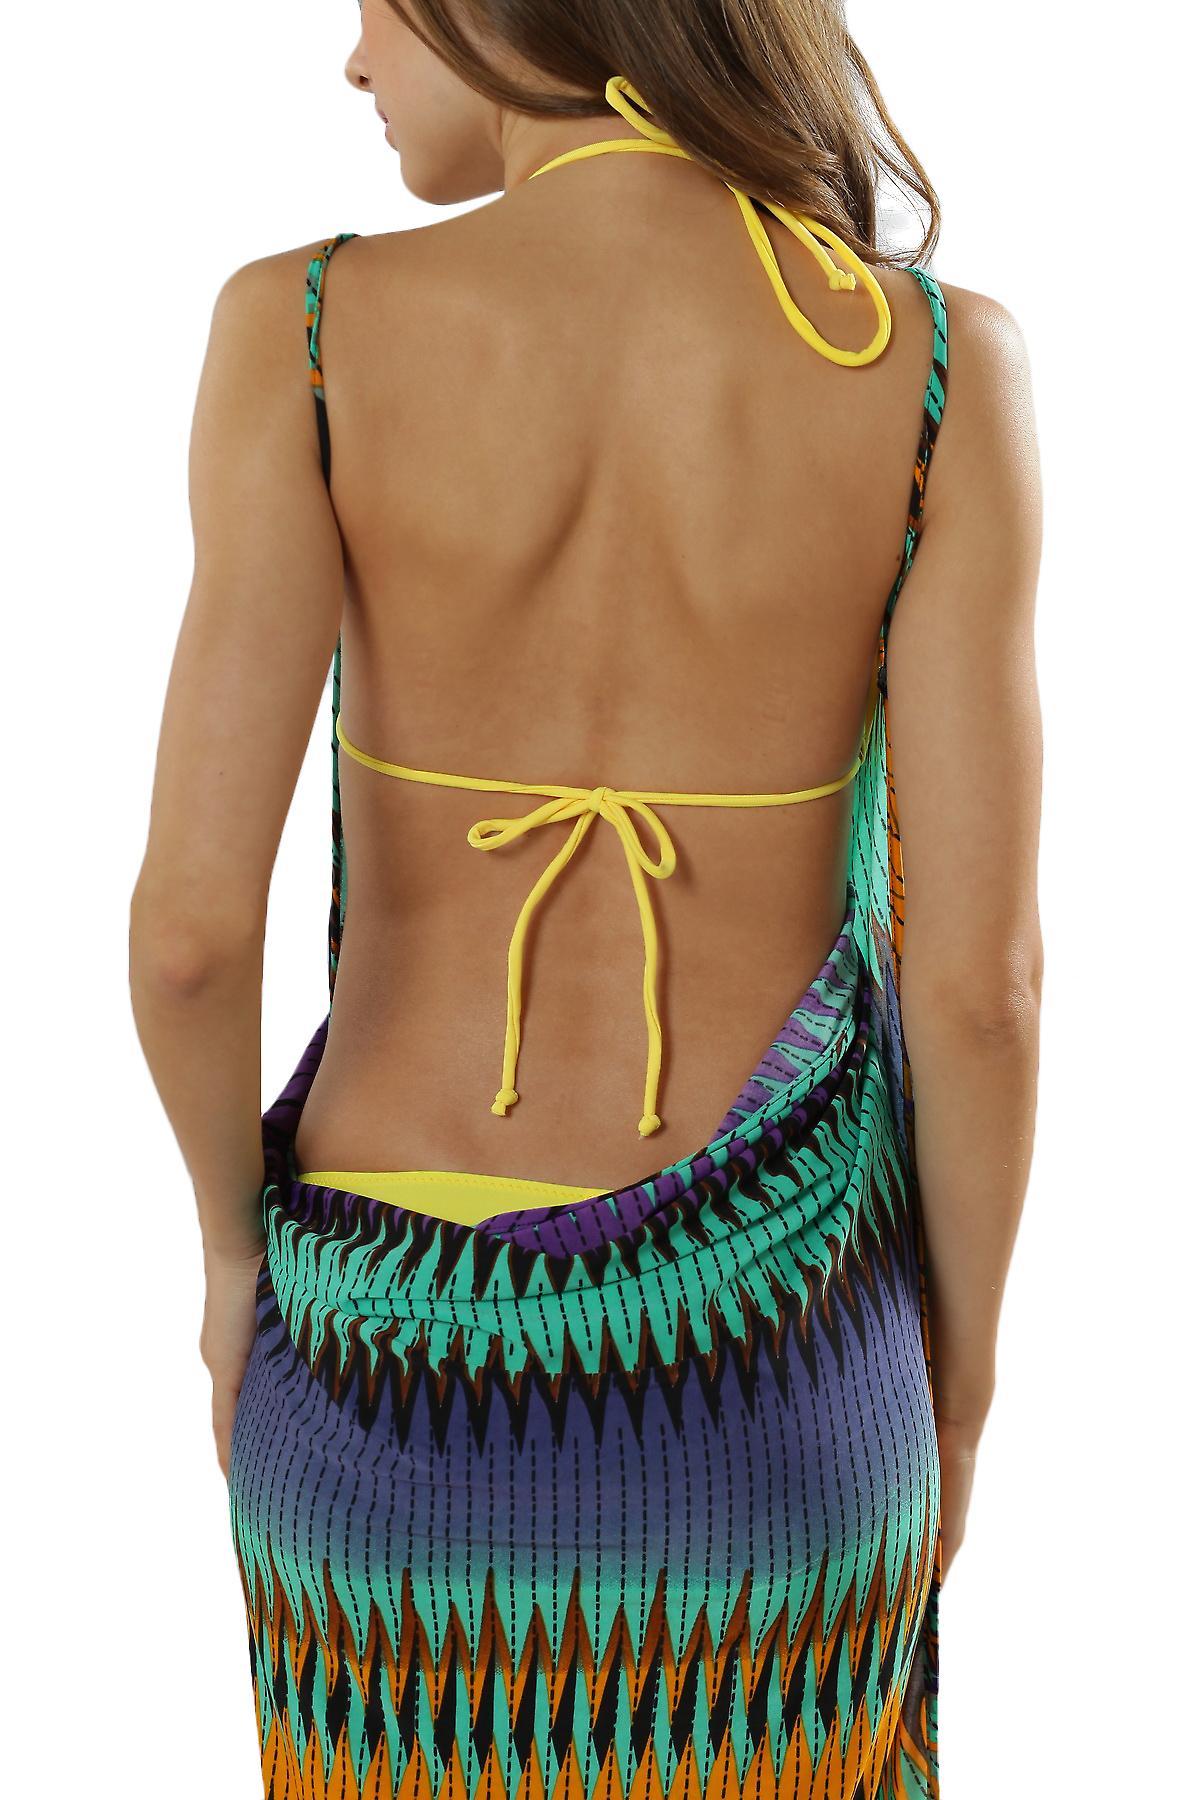 Waooh - Fashion - Pareo / Beach dress